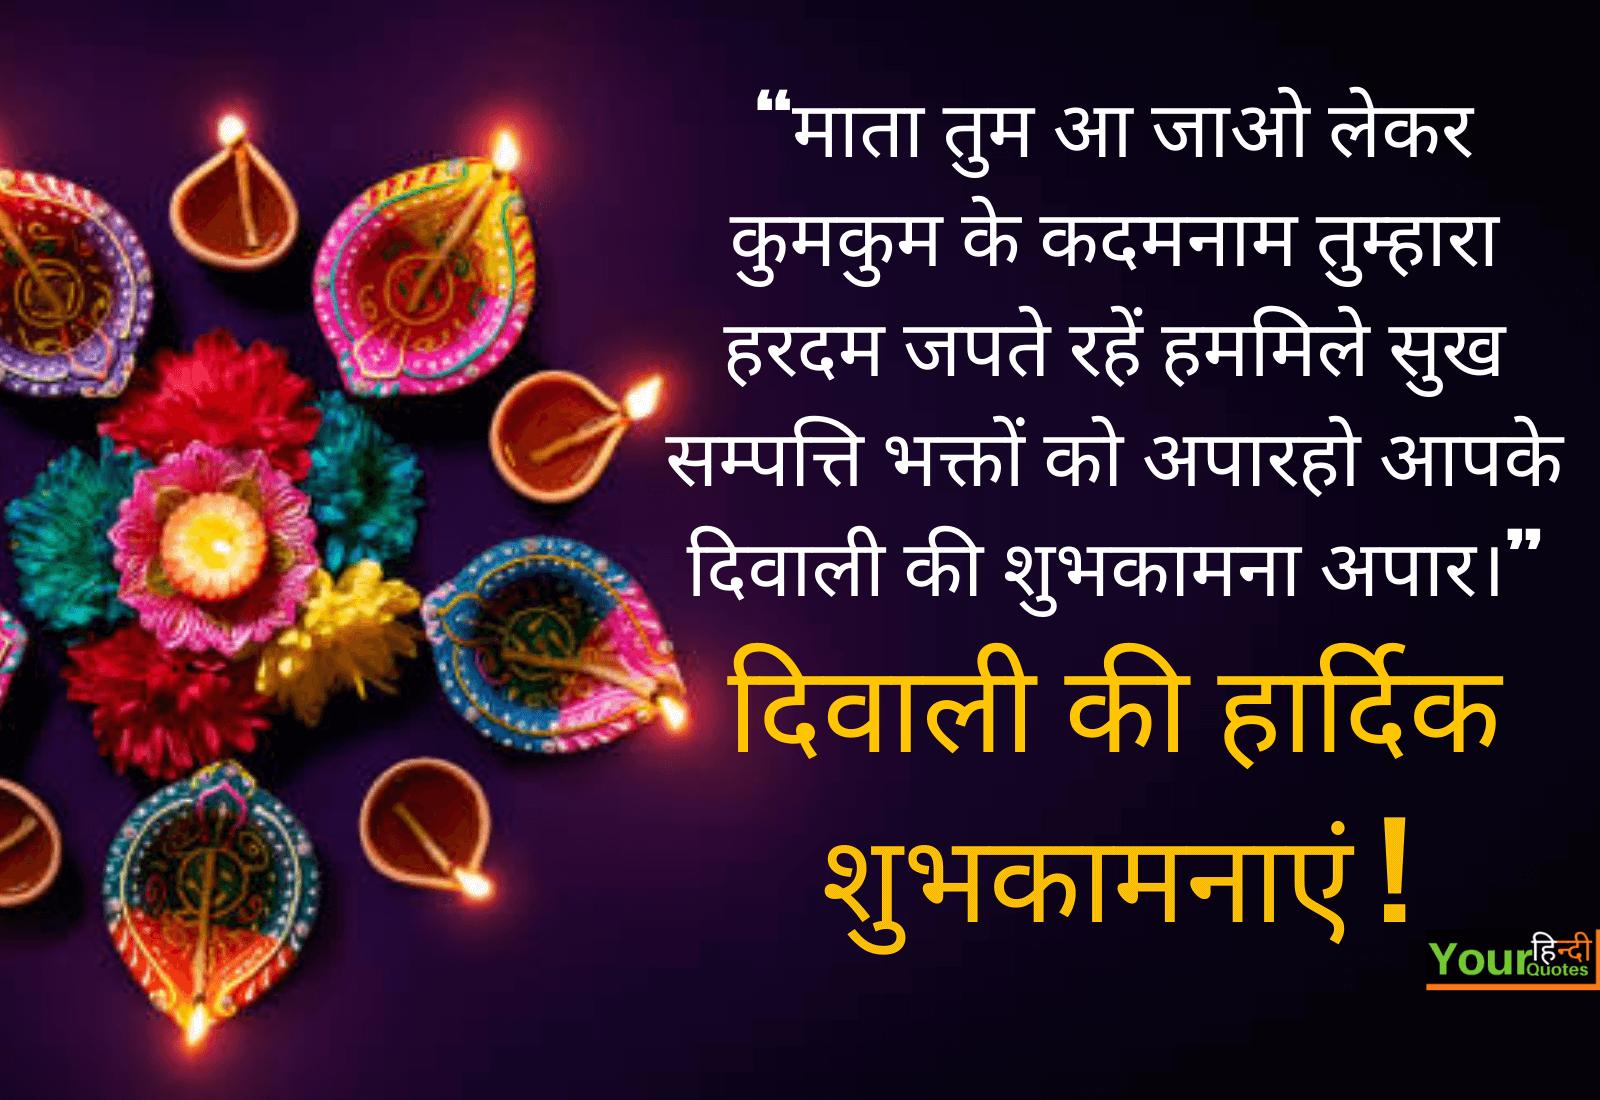 Diwali Image in Hindi picture